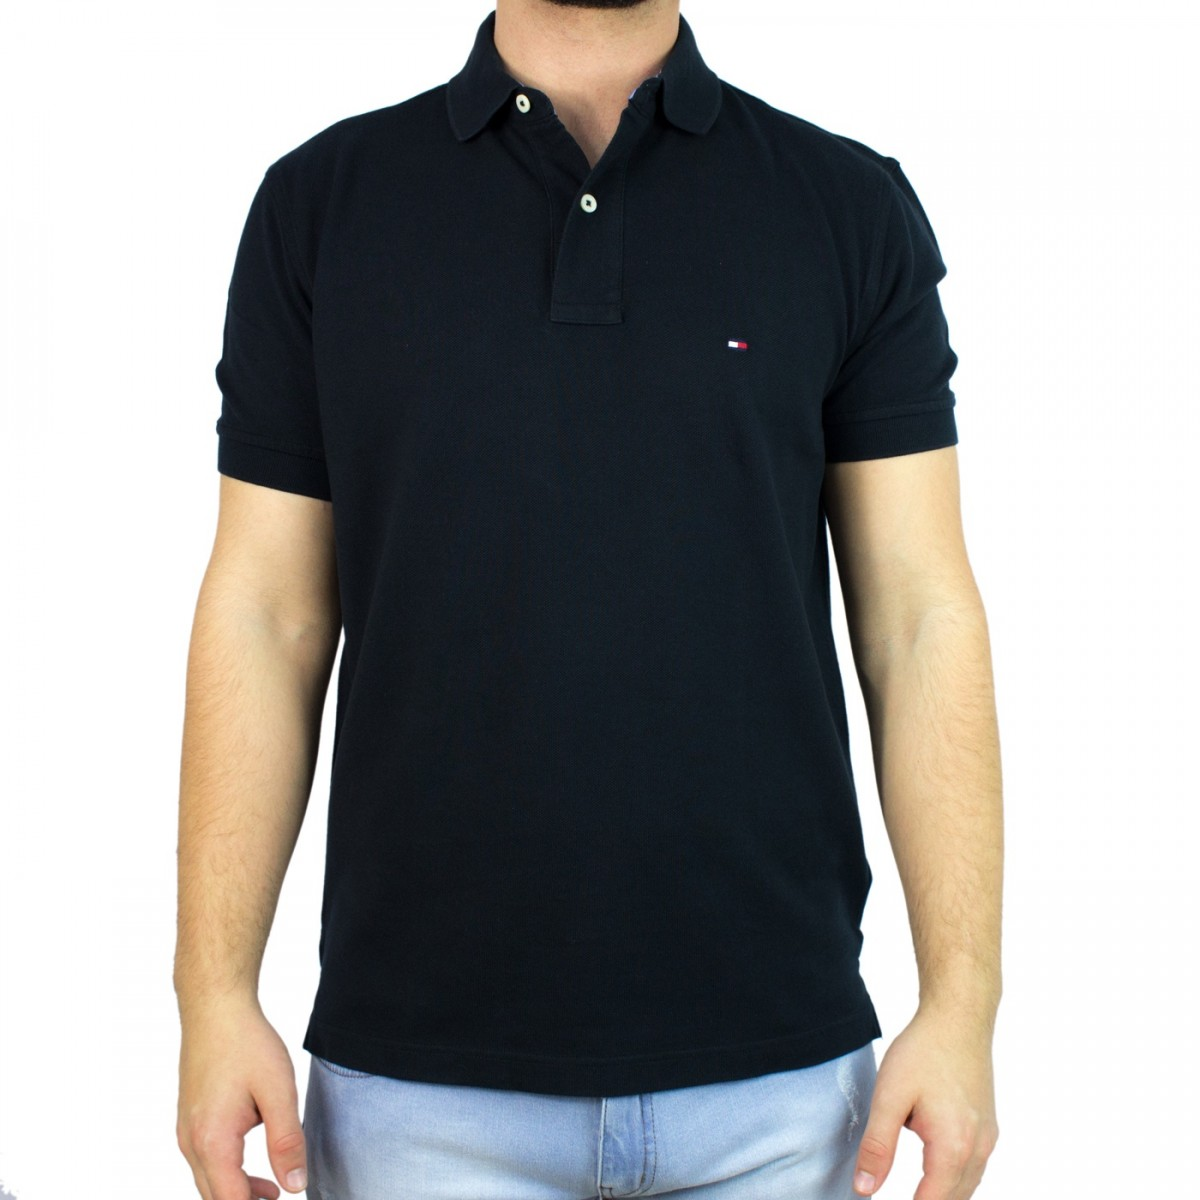 1953d85833 Bizz Store - Camisa Polo Masculina Tommy Hilfiger Preta